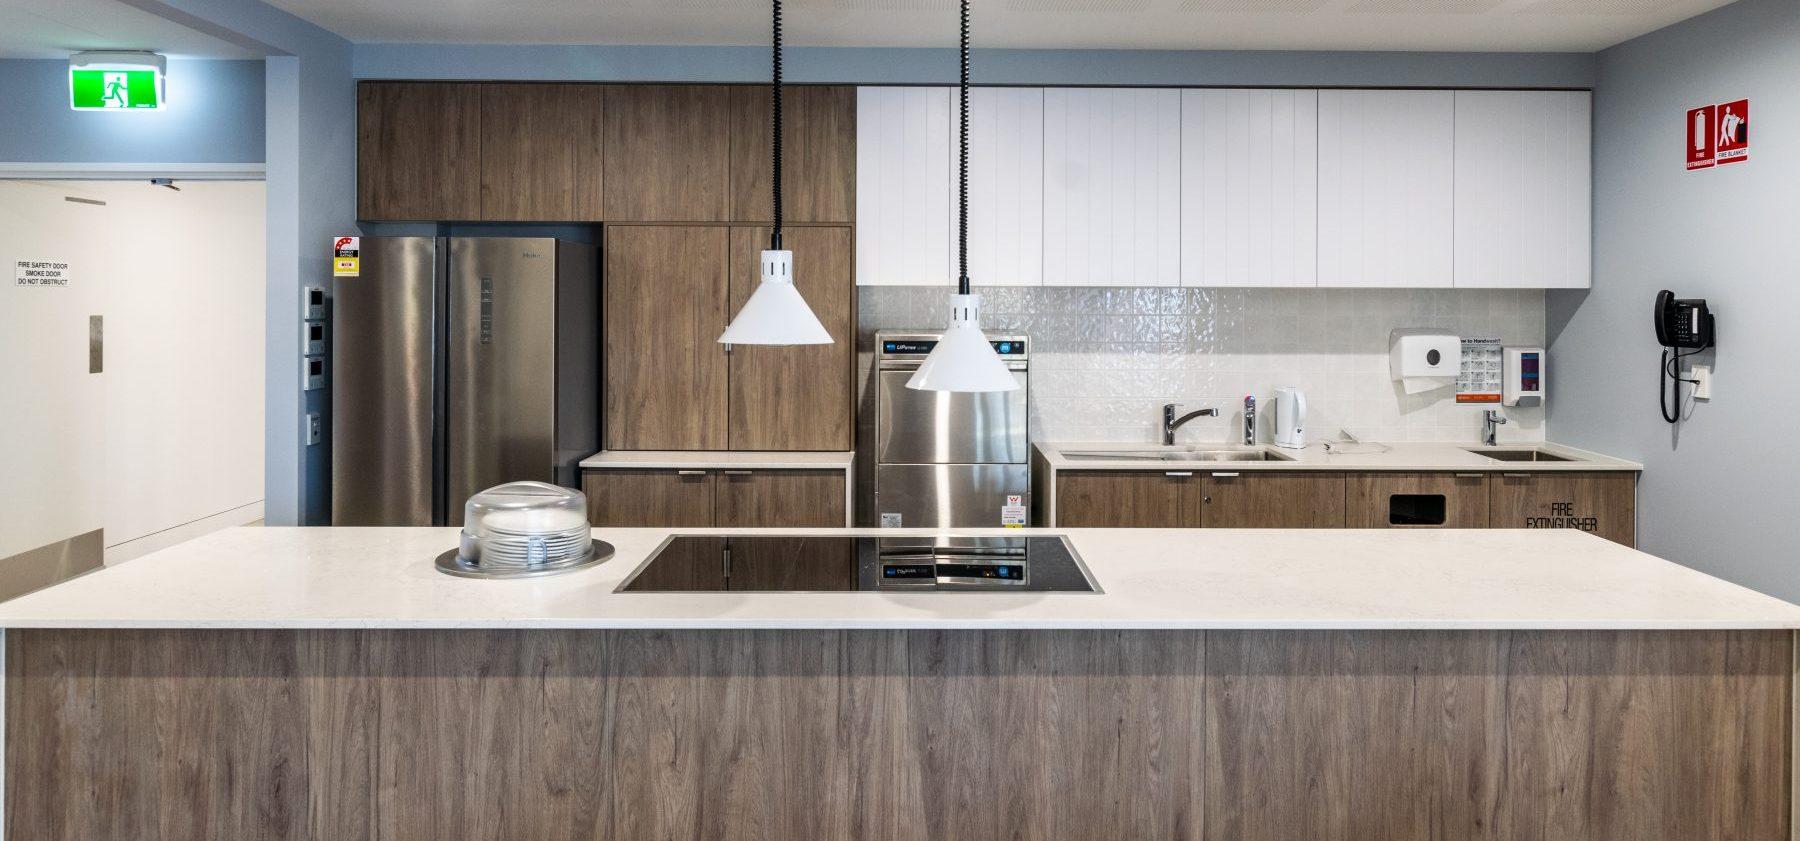 Arcare Noosa Interior Kitchen